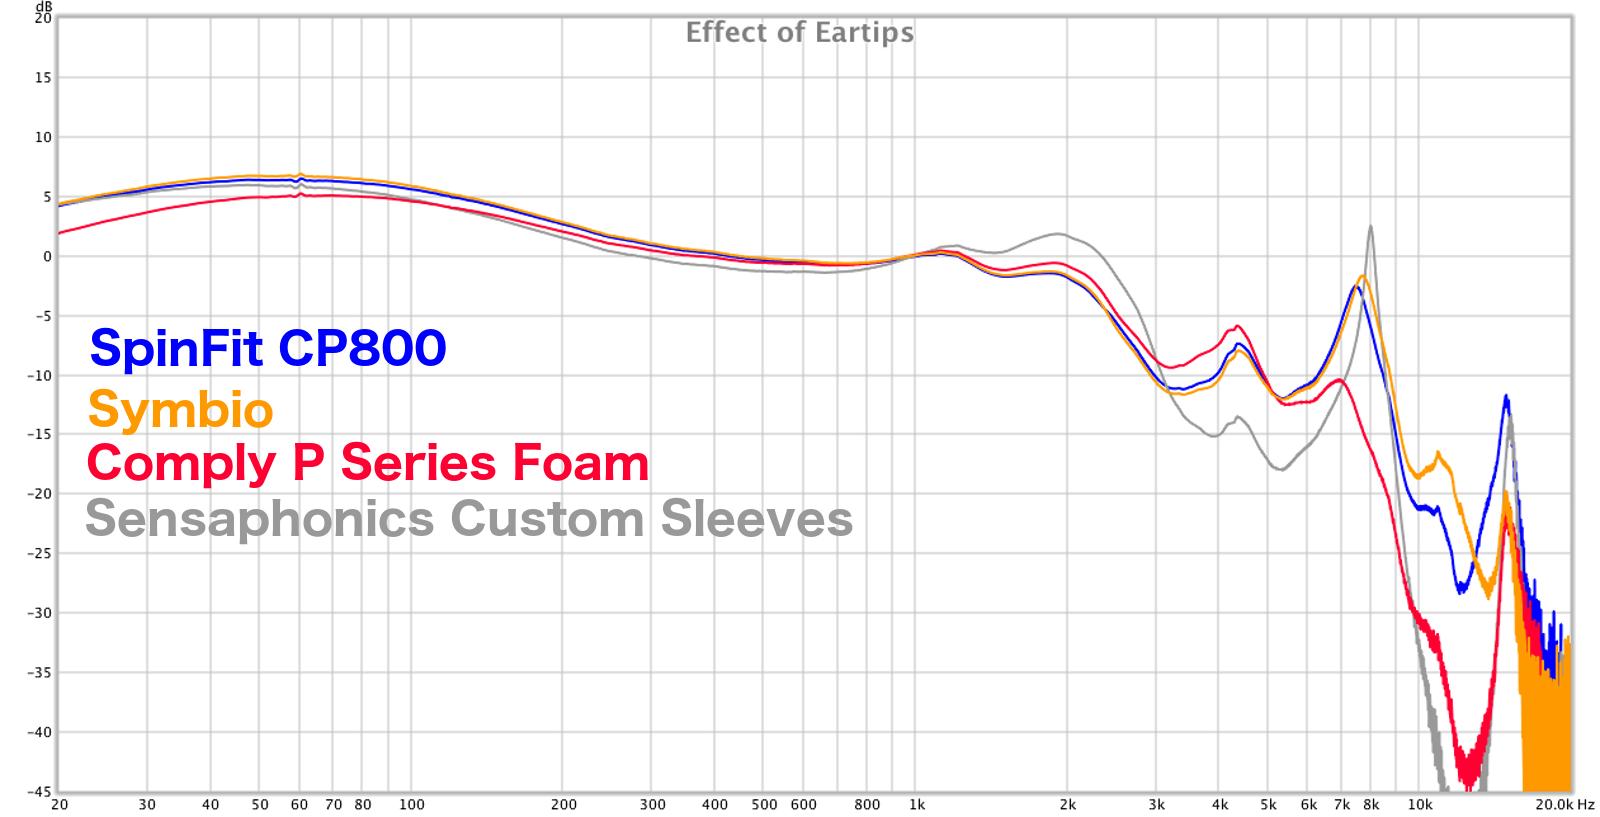 effect_of_eartips.png